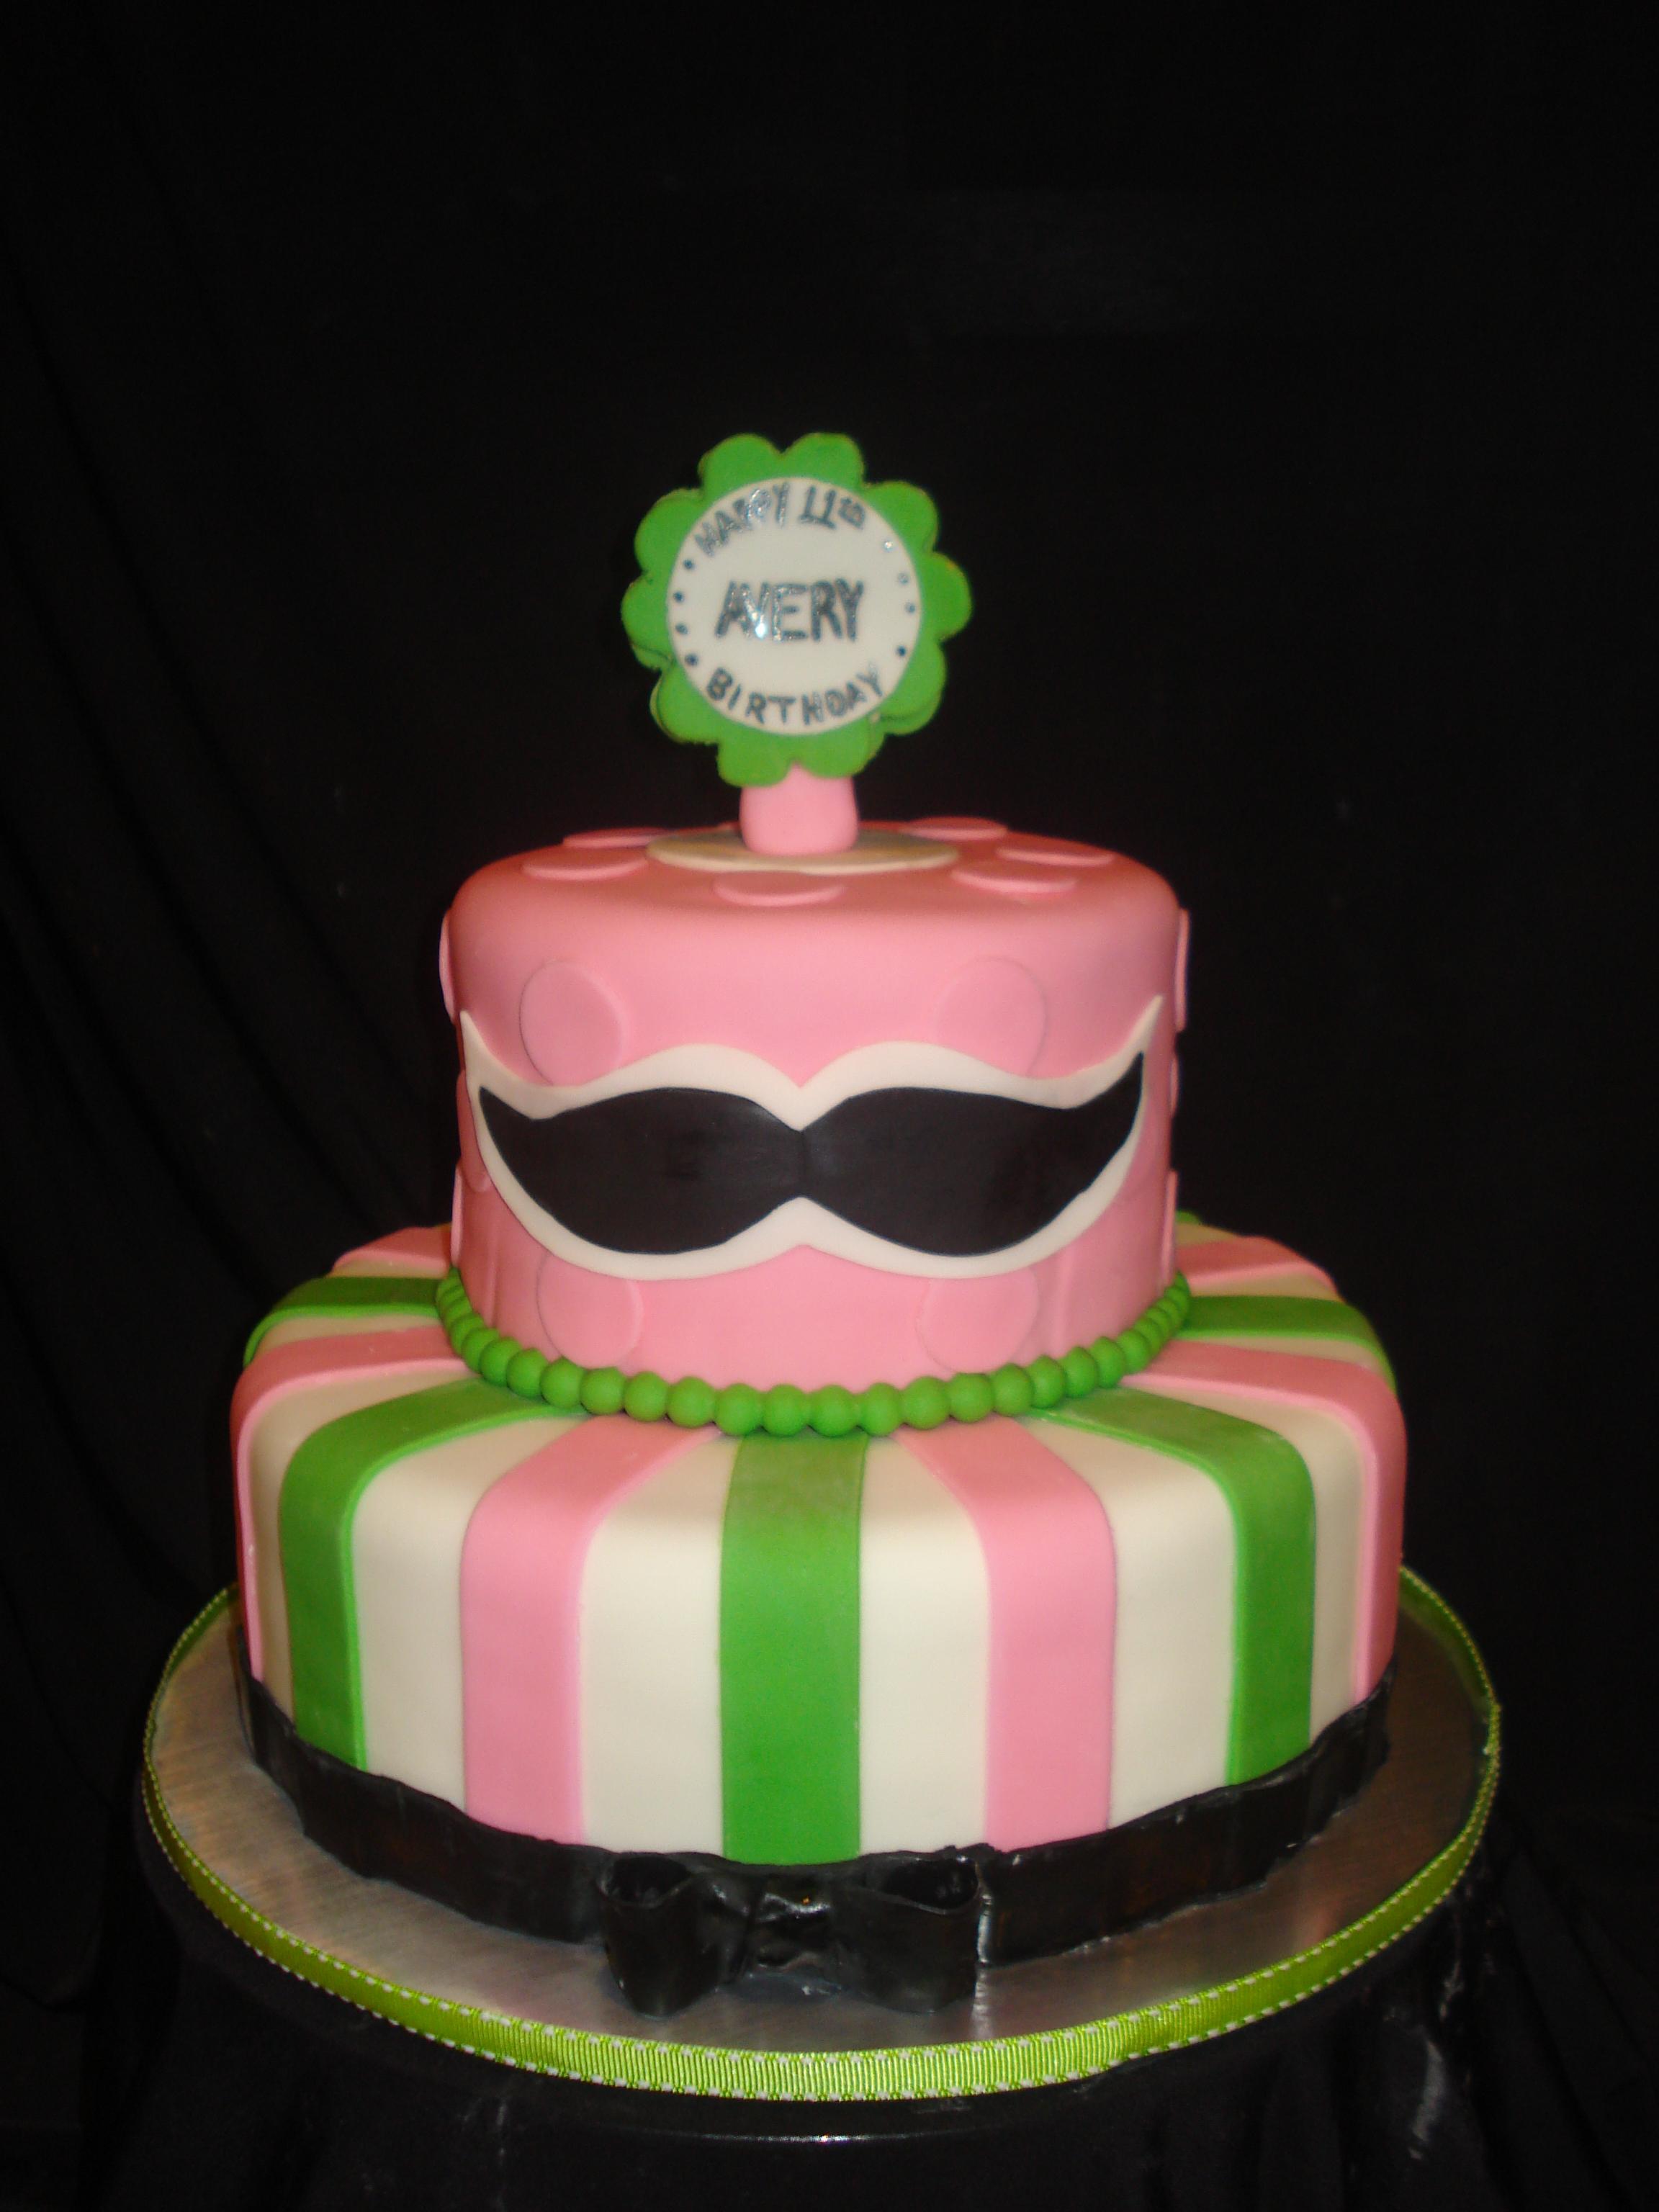 Elegant 40th Birthday Cake Brooch Is Made Of Sugar